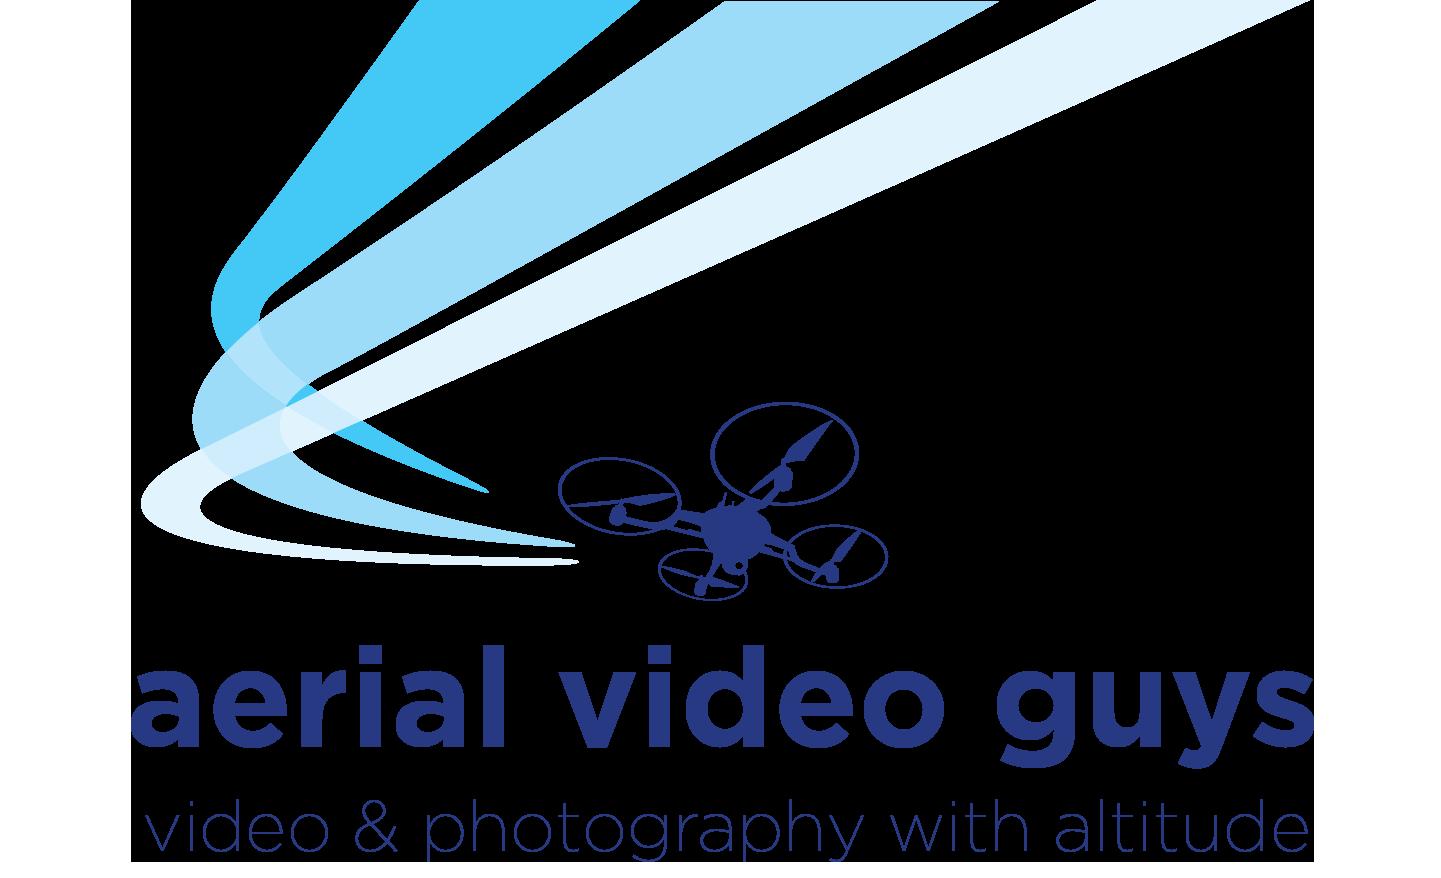 Aerial Video Guys